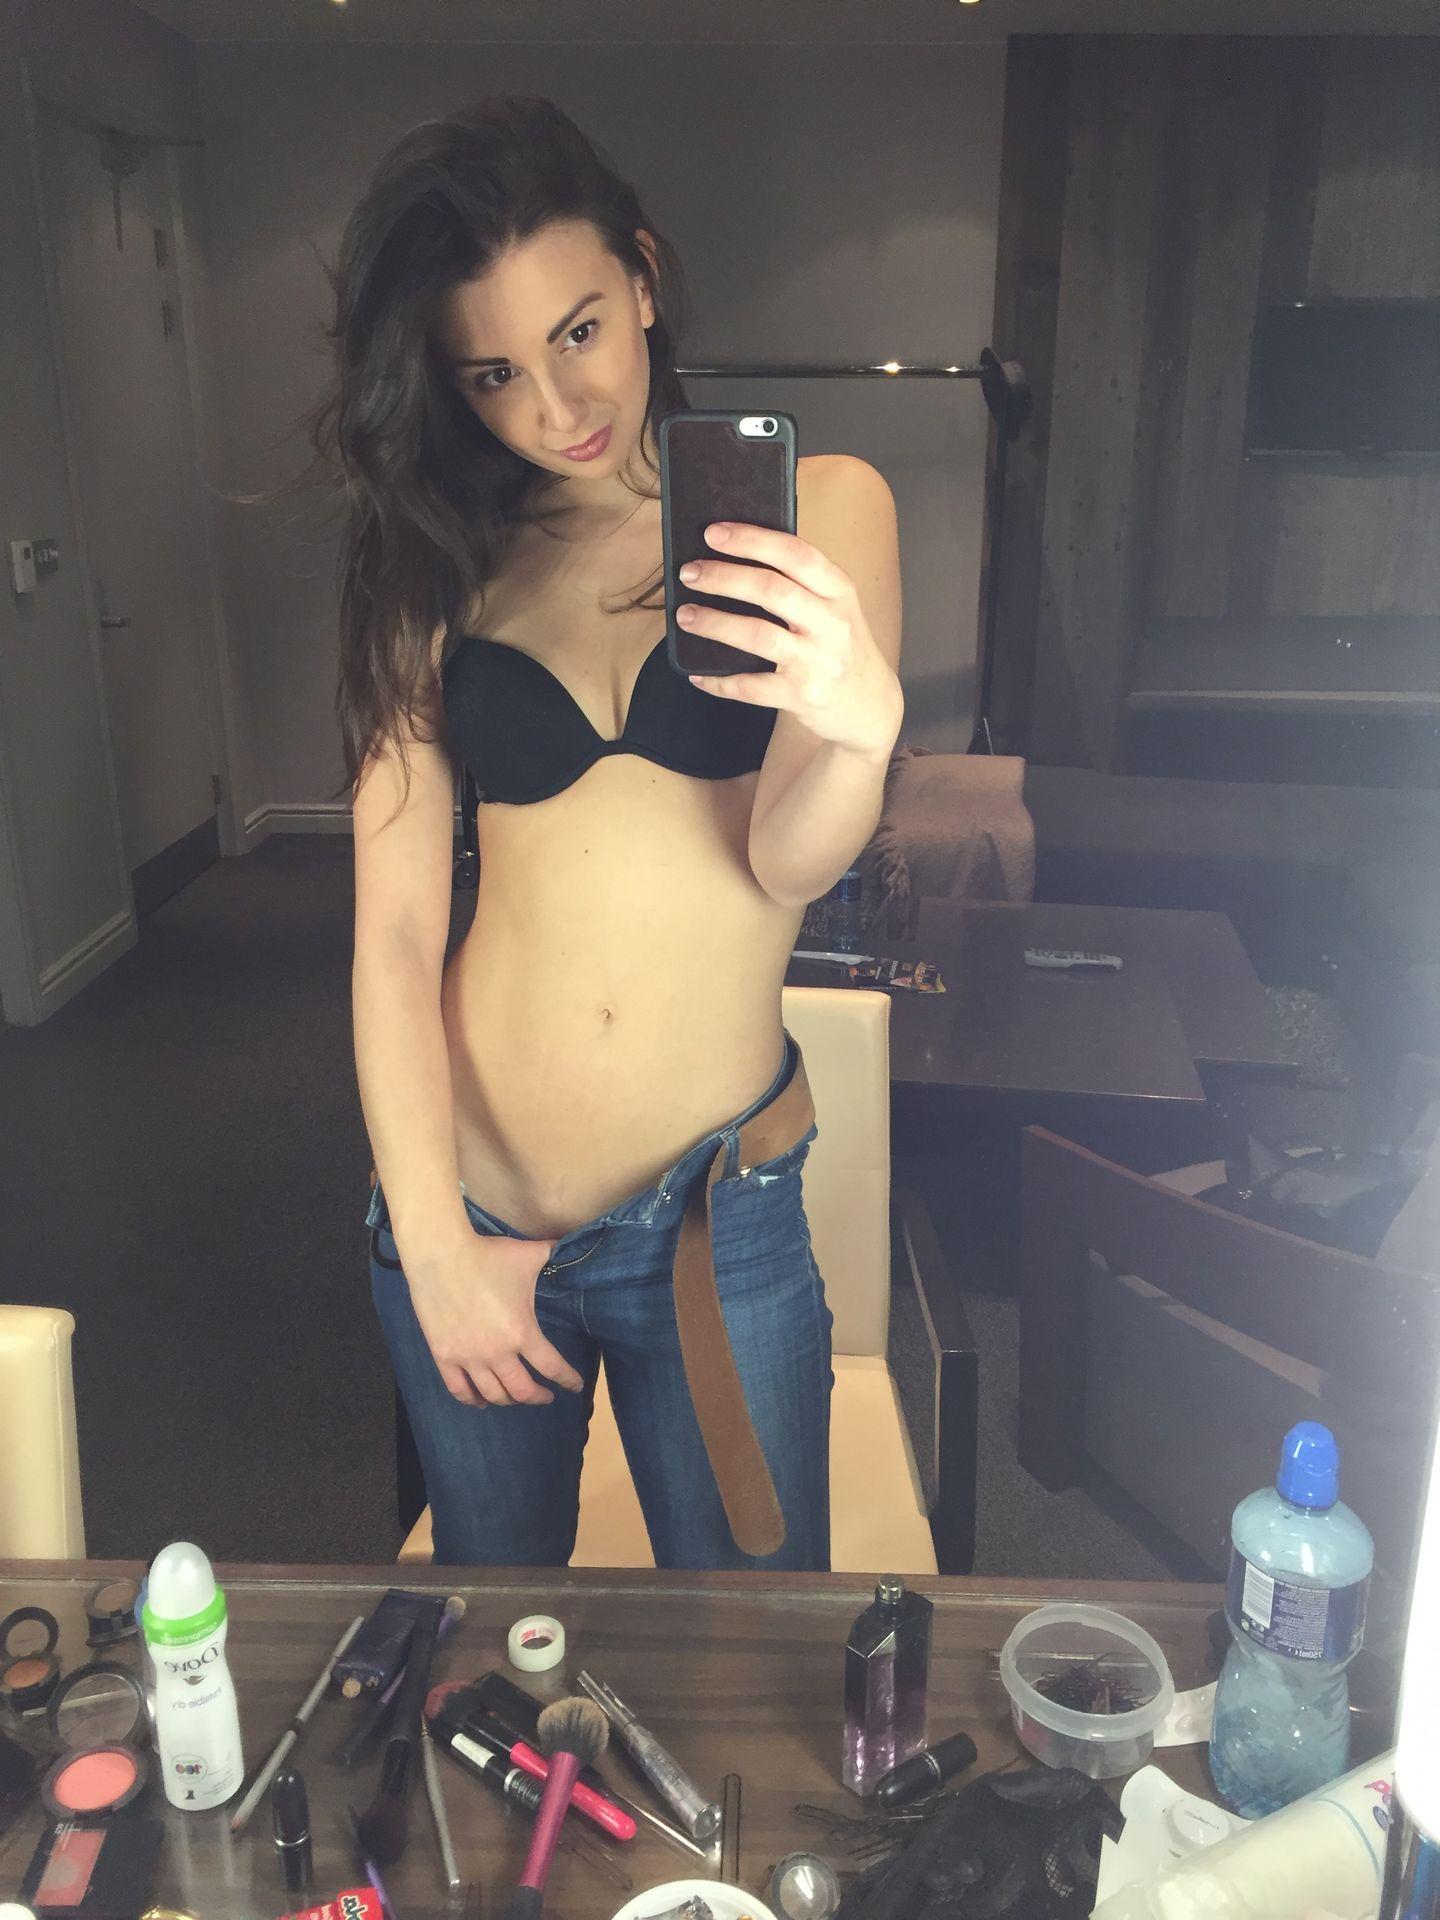 Zizi Strallen Nude Leaked The Fappening 0030